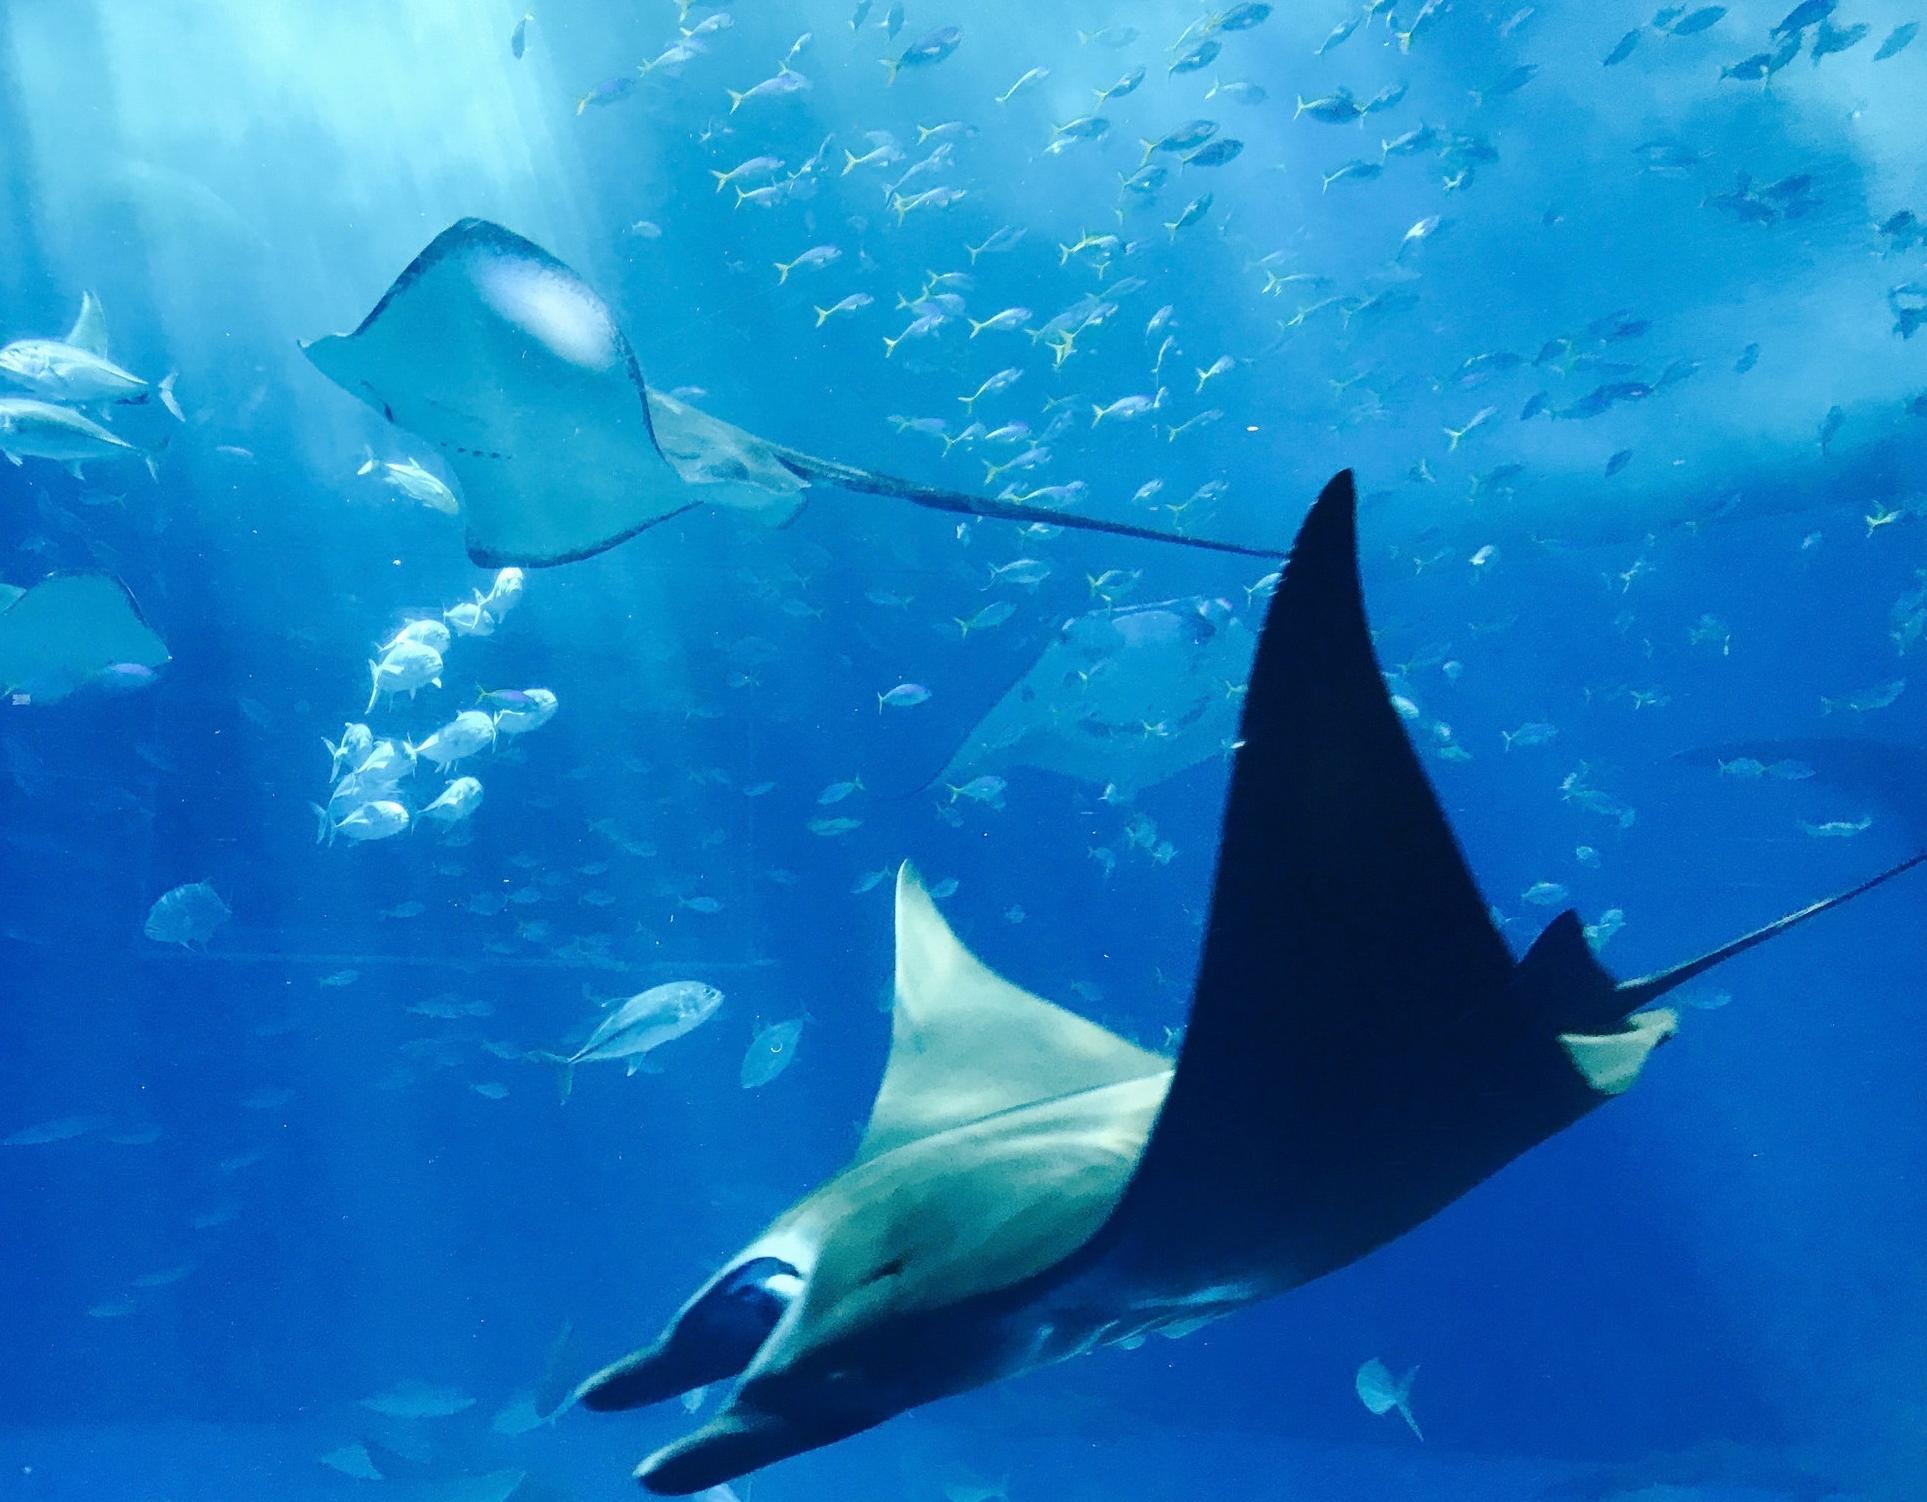 mobilechallenge-animals-aquarium-889929.jpg